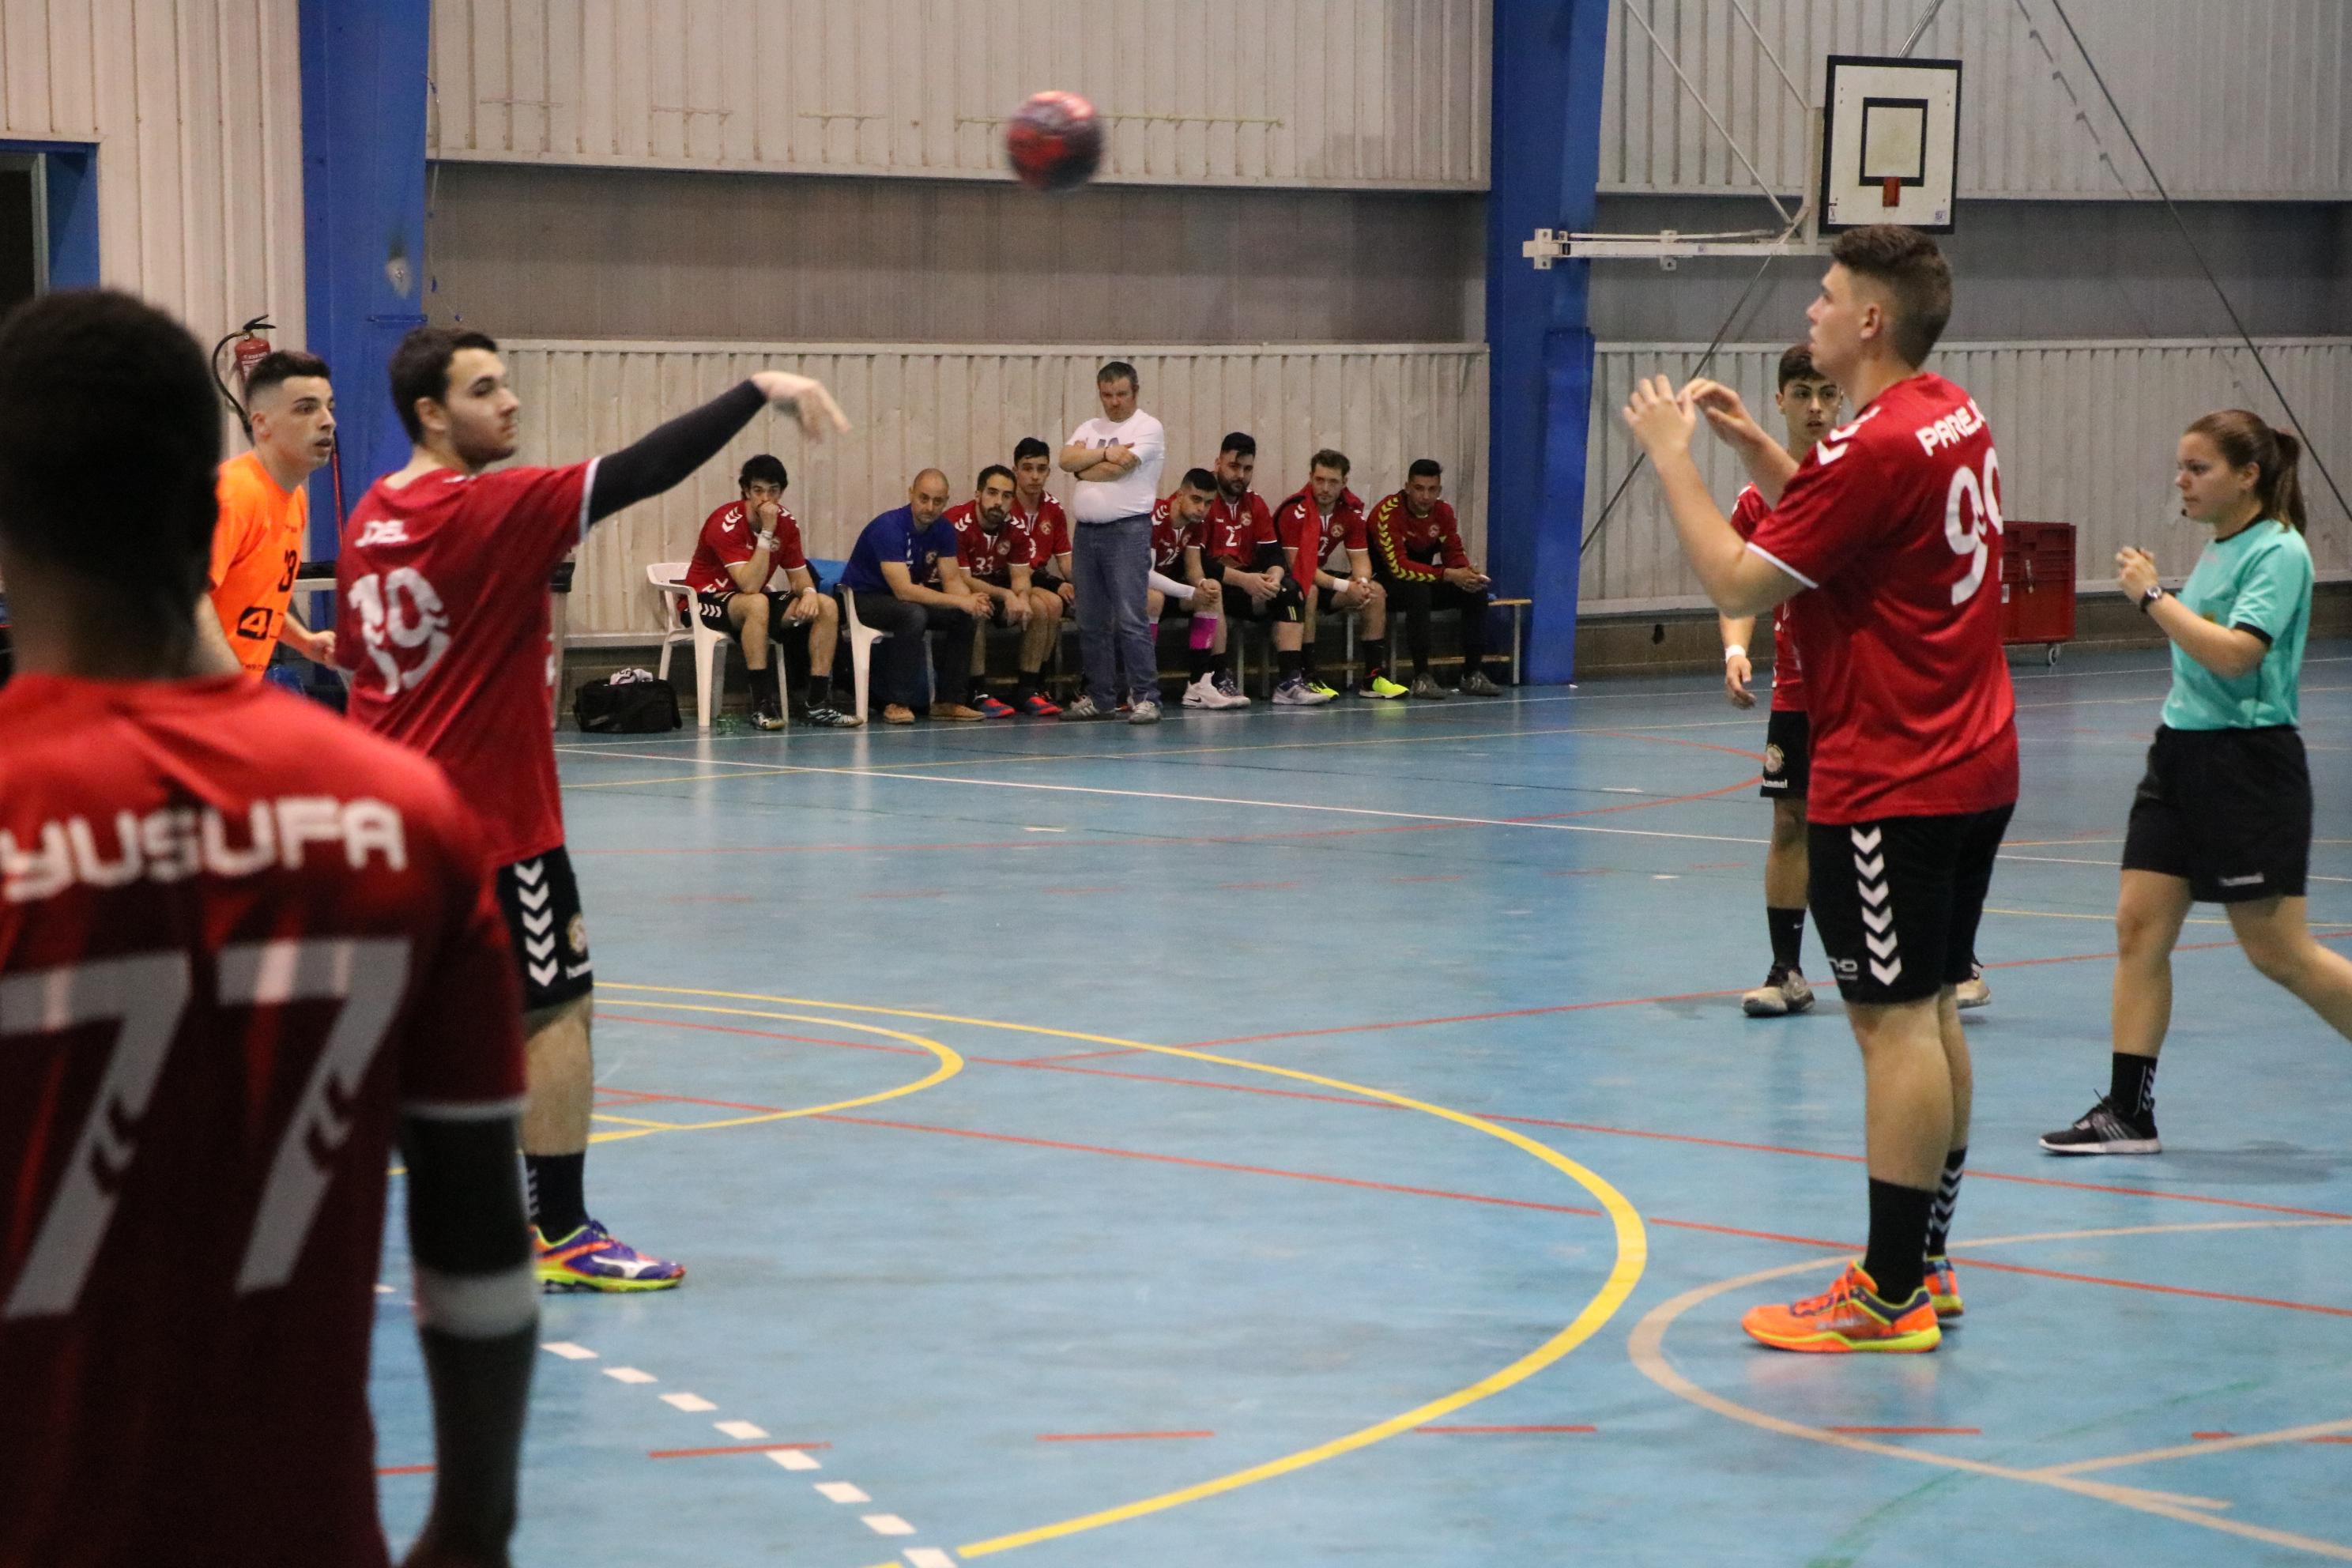 Victòria del Joventut Handbol contra el penúltim, el Sant Joan Despí C, (30-25)